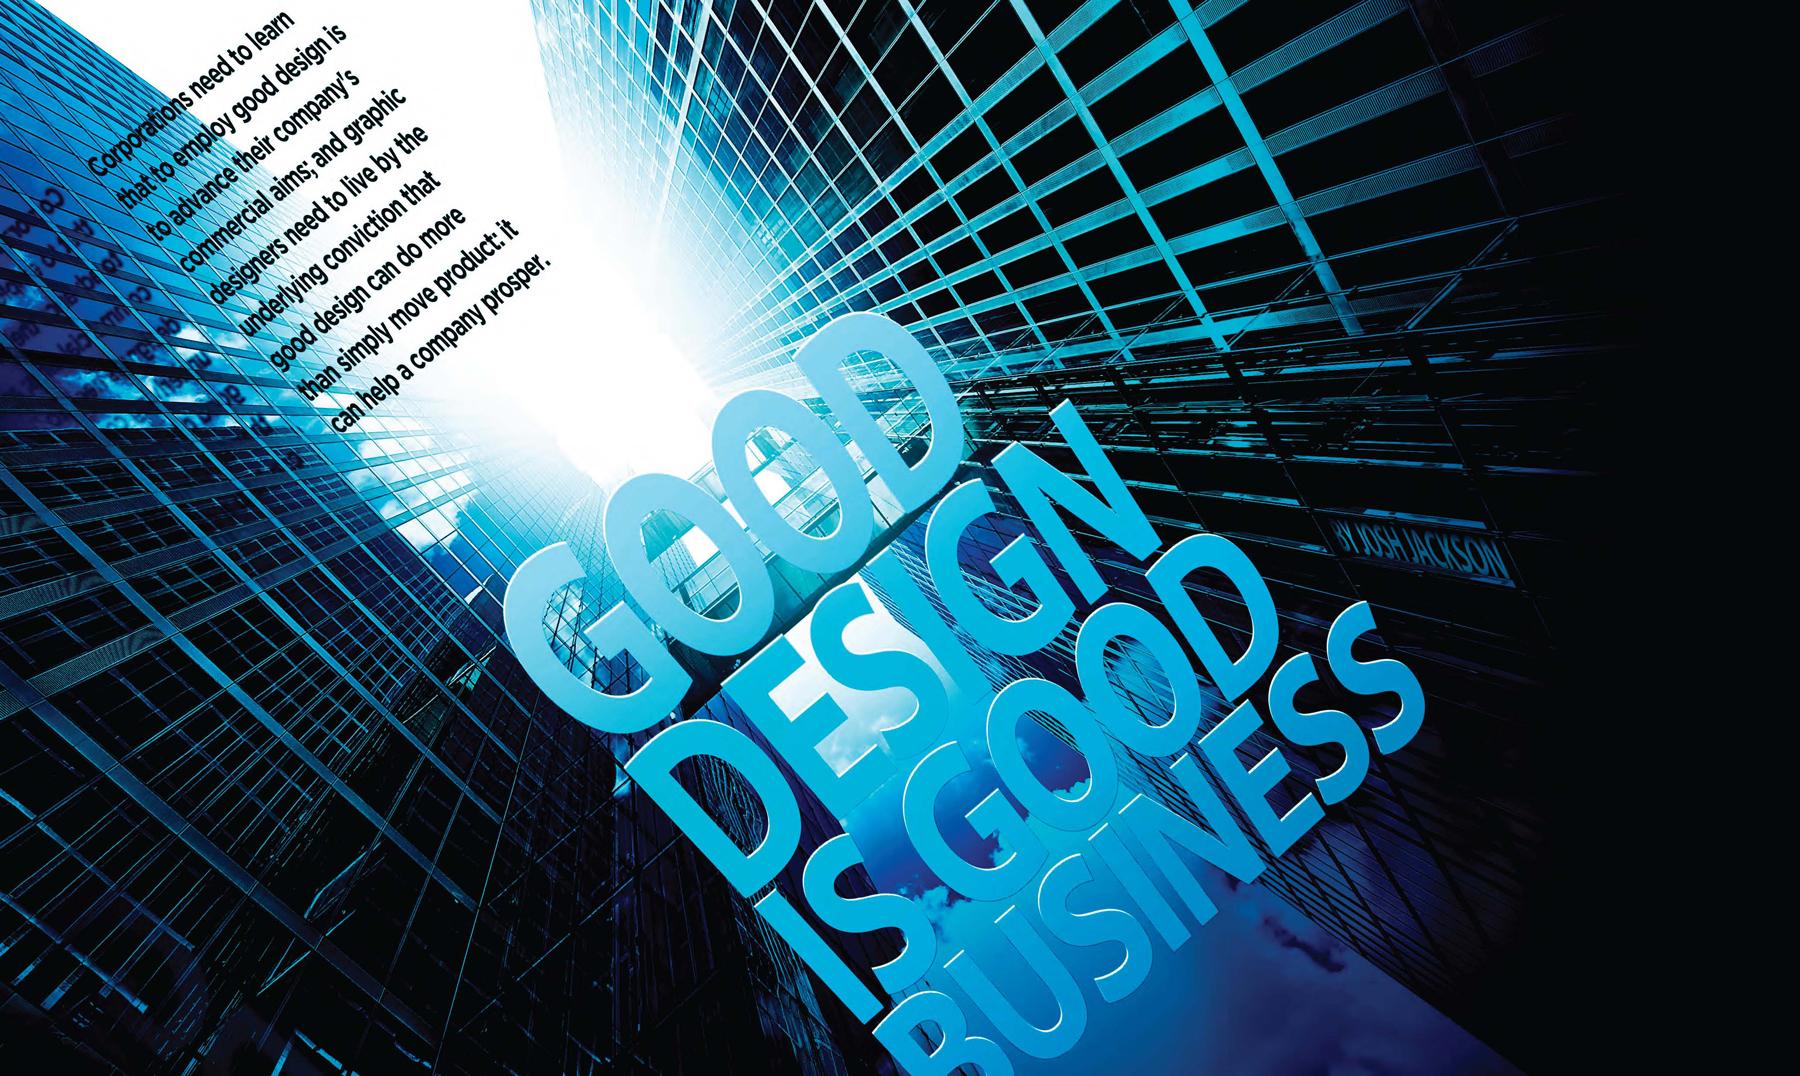 Metropolis magazine spread design